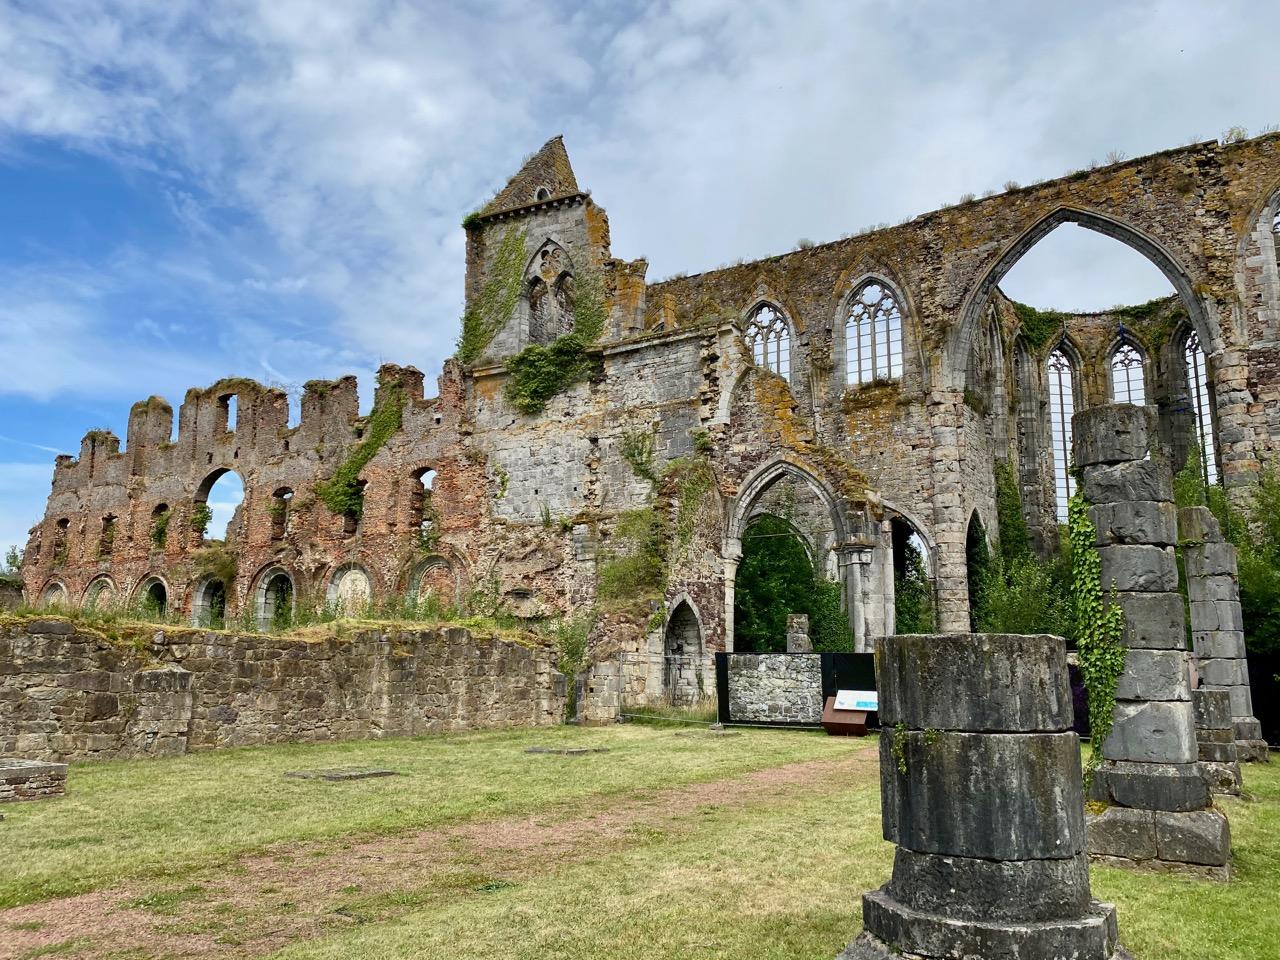 Pays-des-Lacs-Thuin-abbaye-d-aulne-ruines